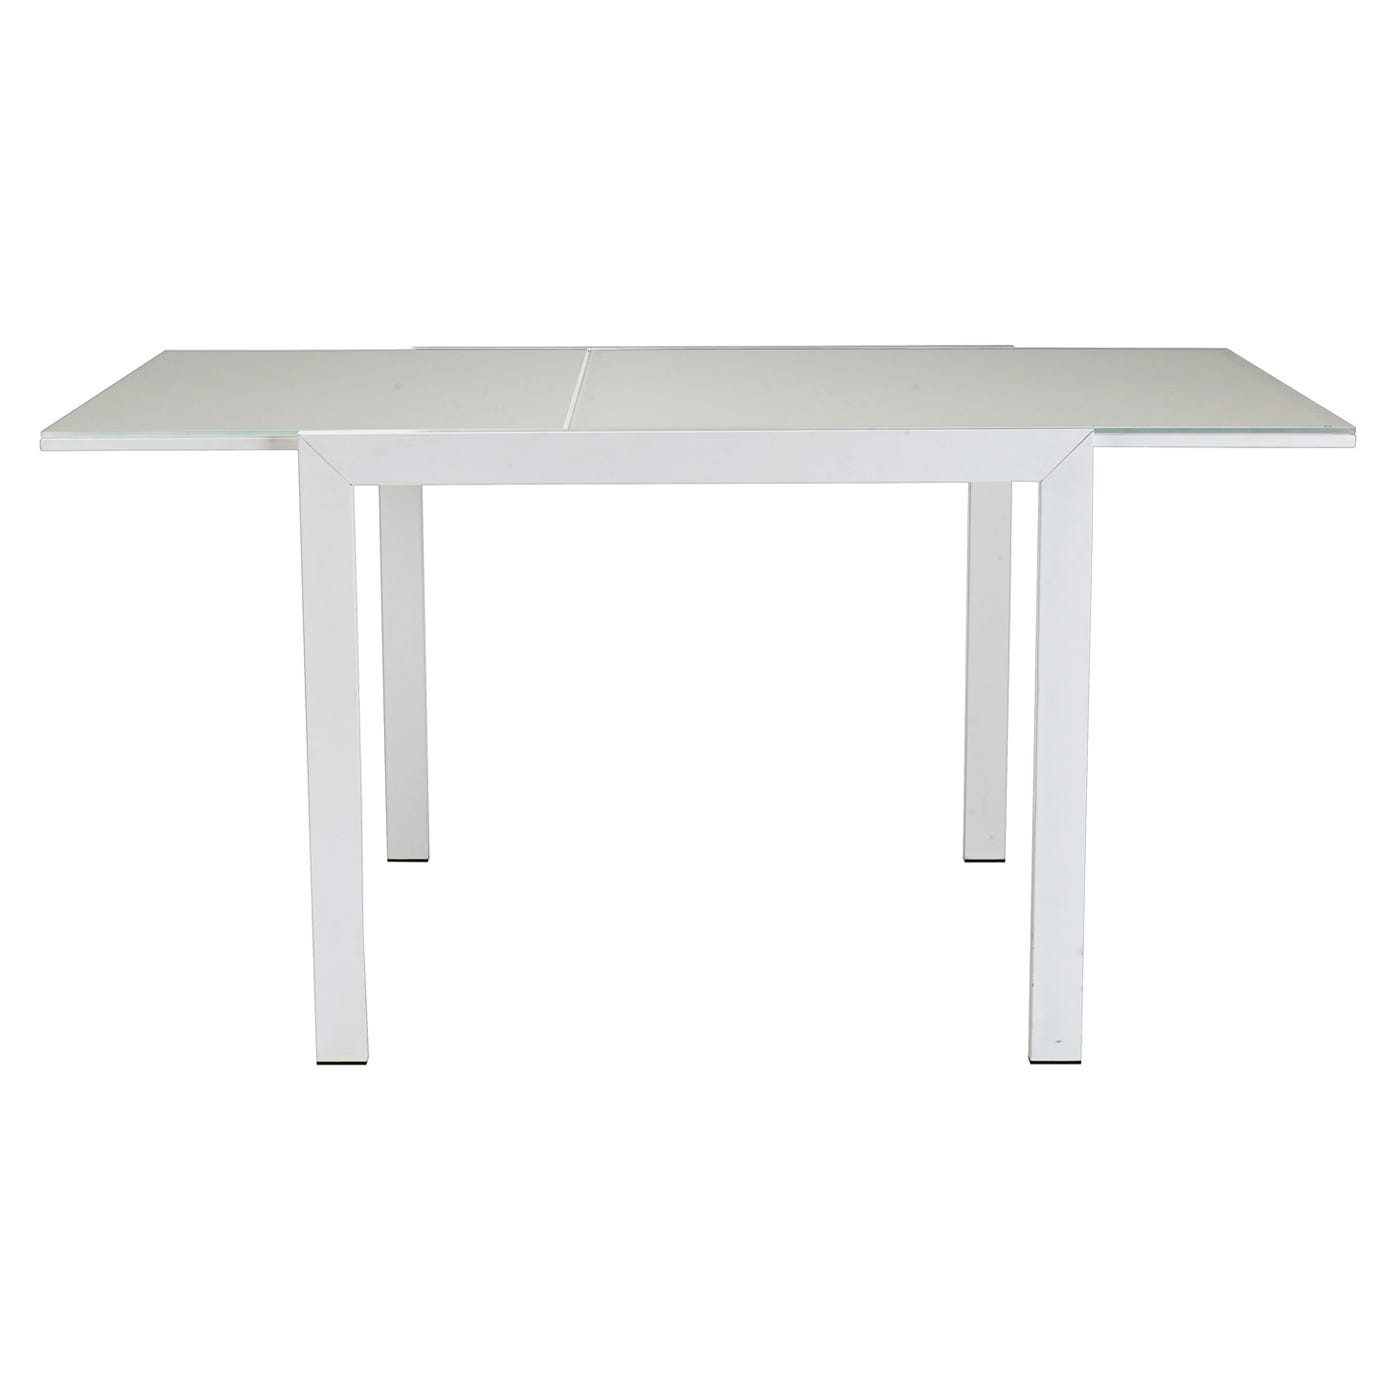 Key Extending Table